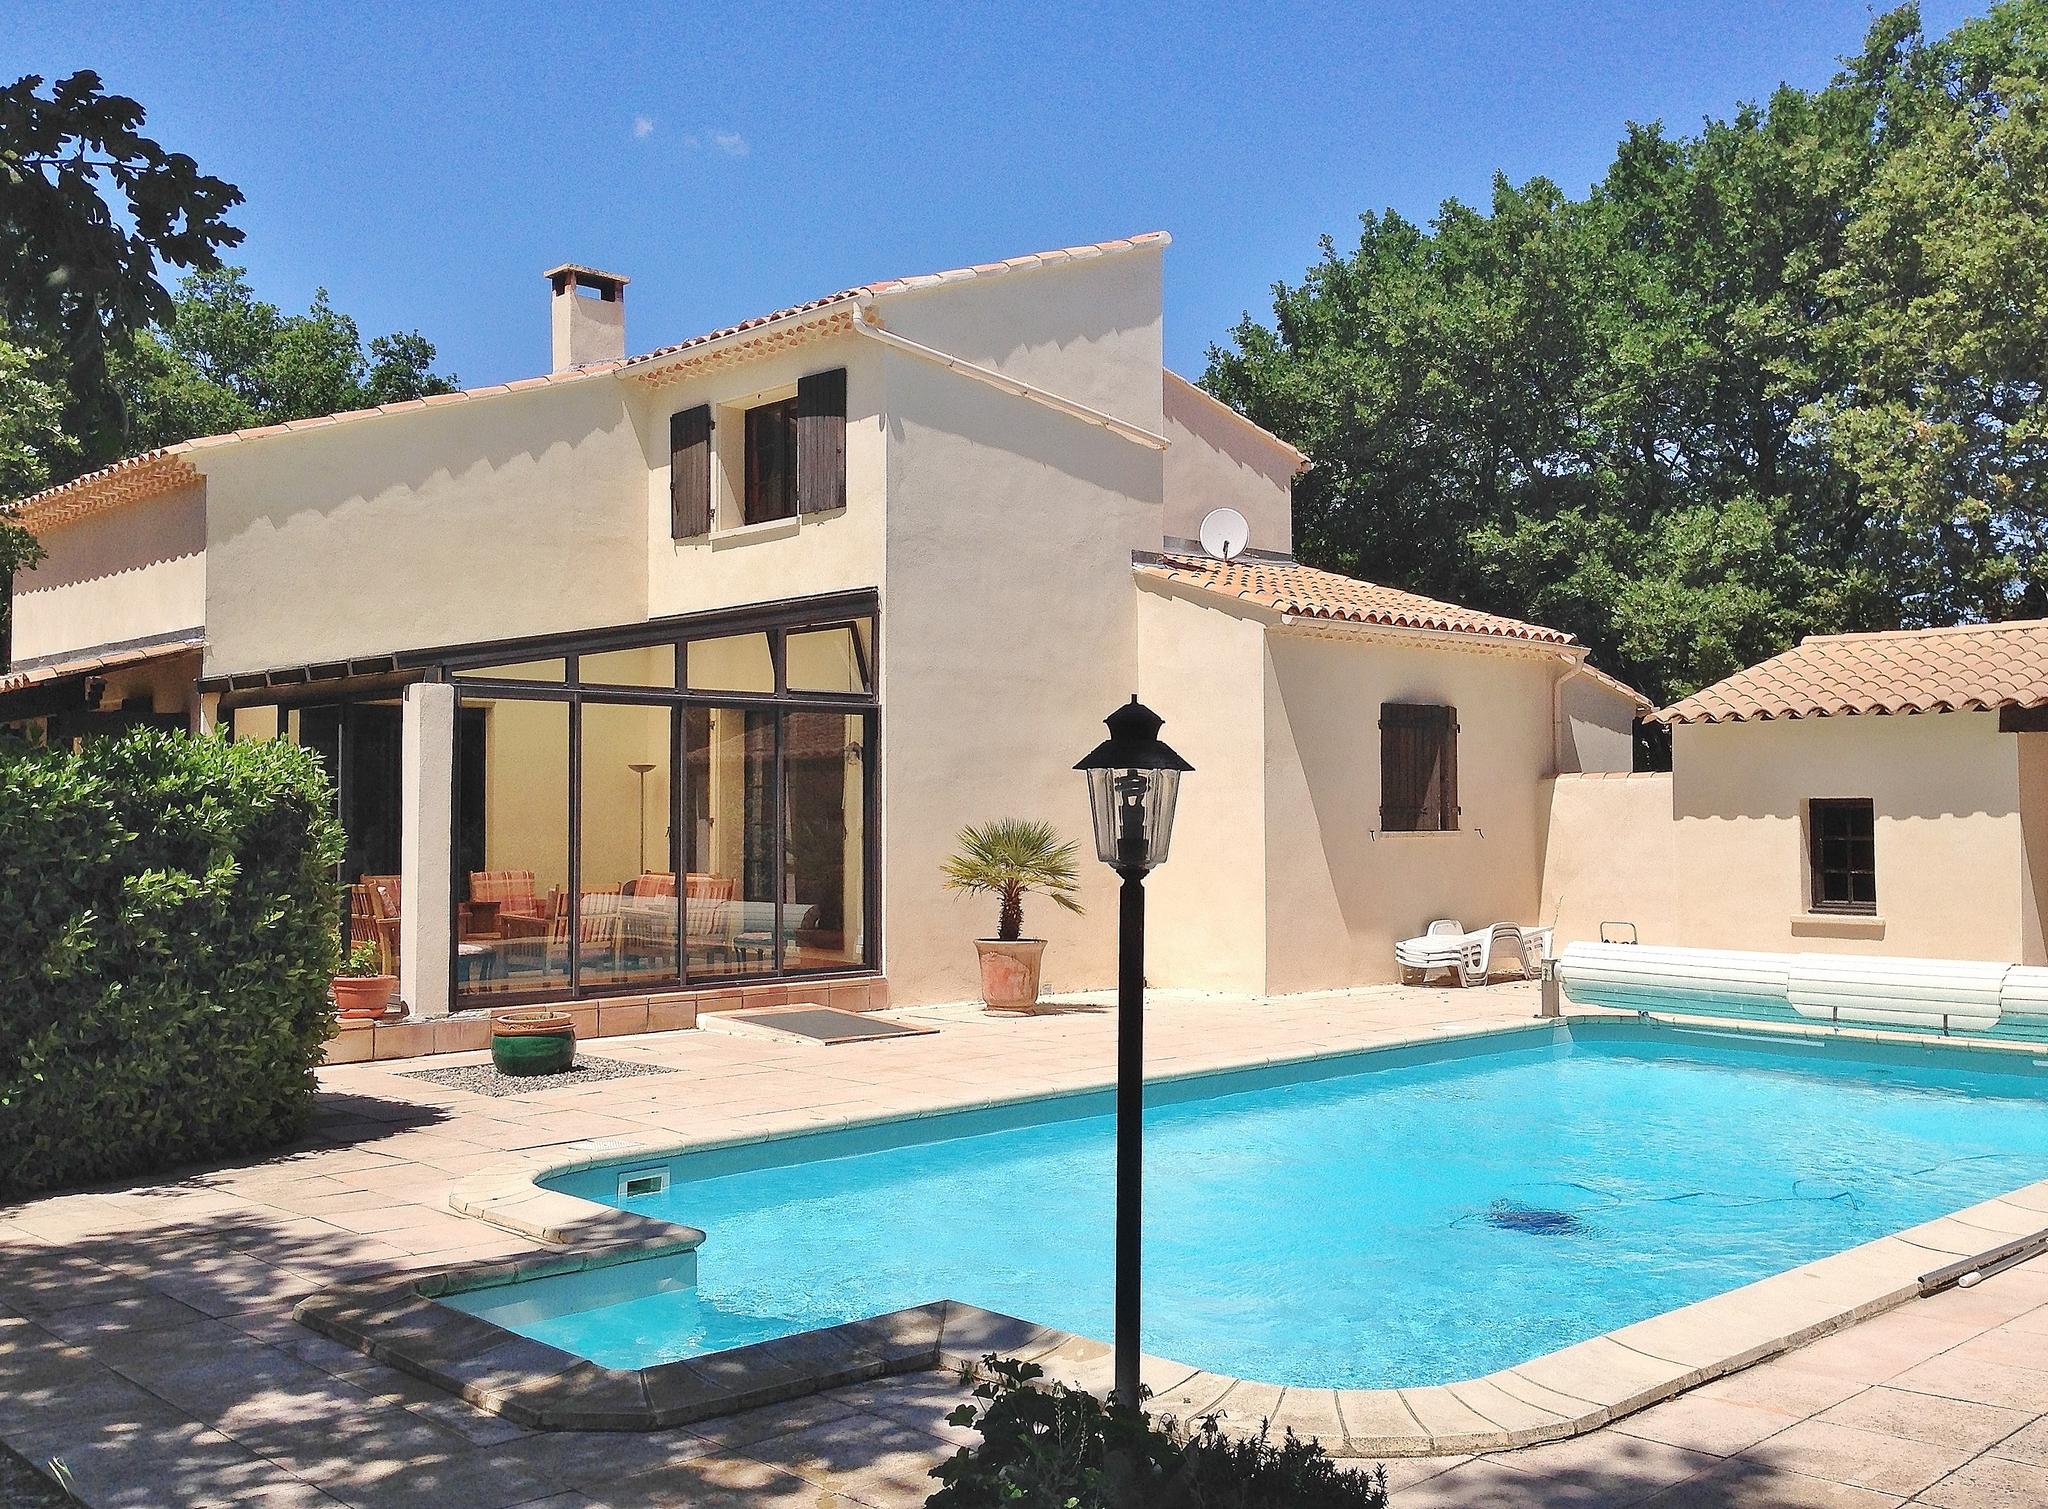 Location en provence villa li roure for Location villa salon de provence